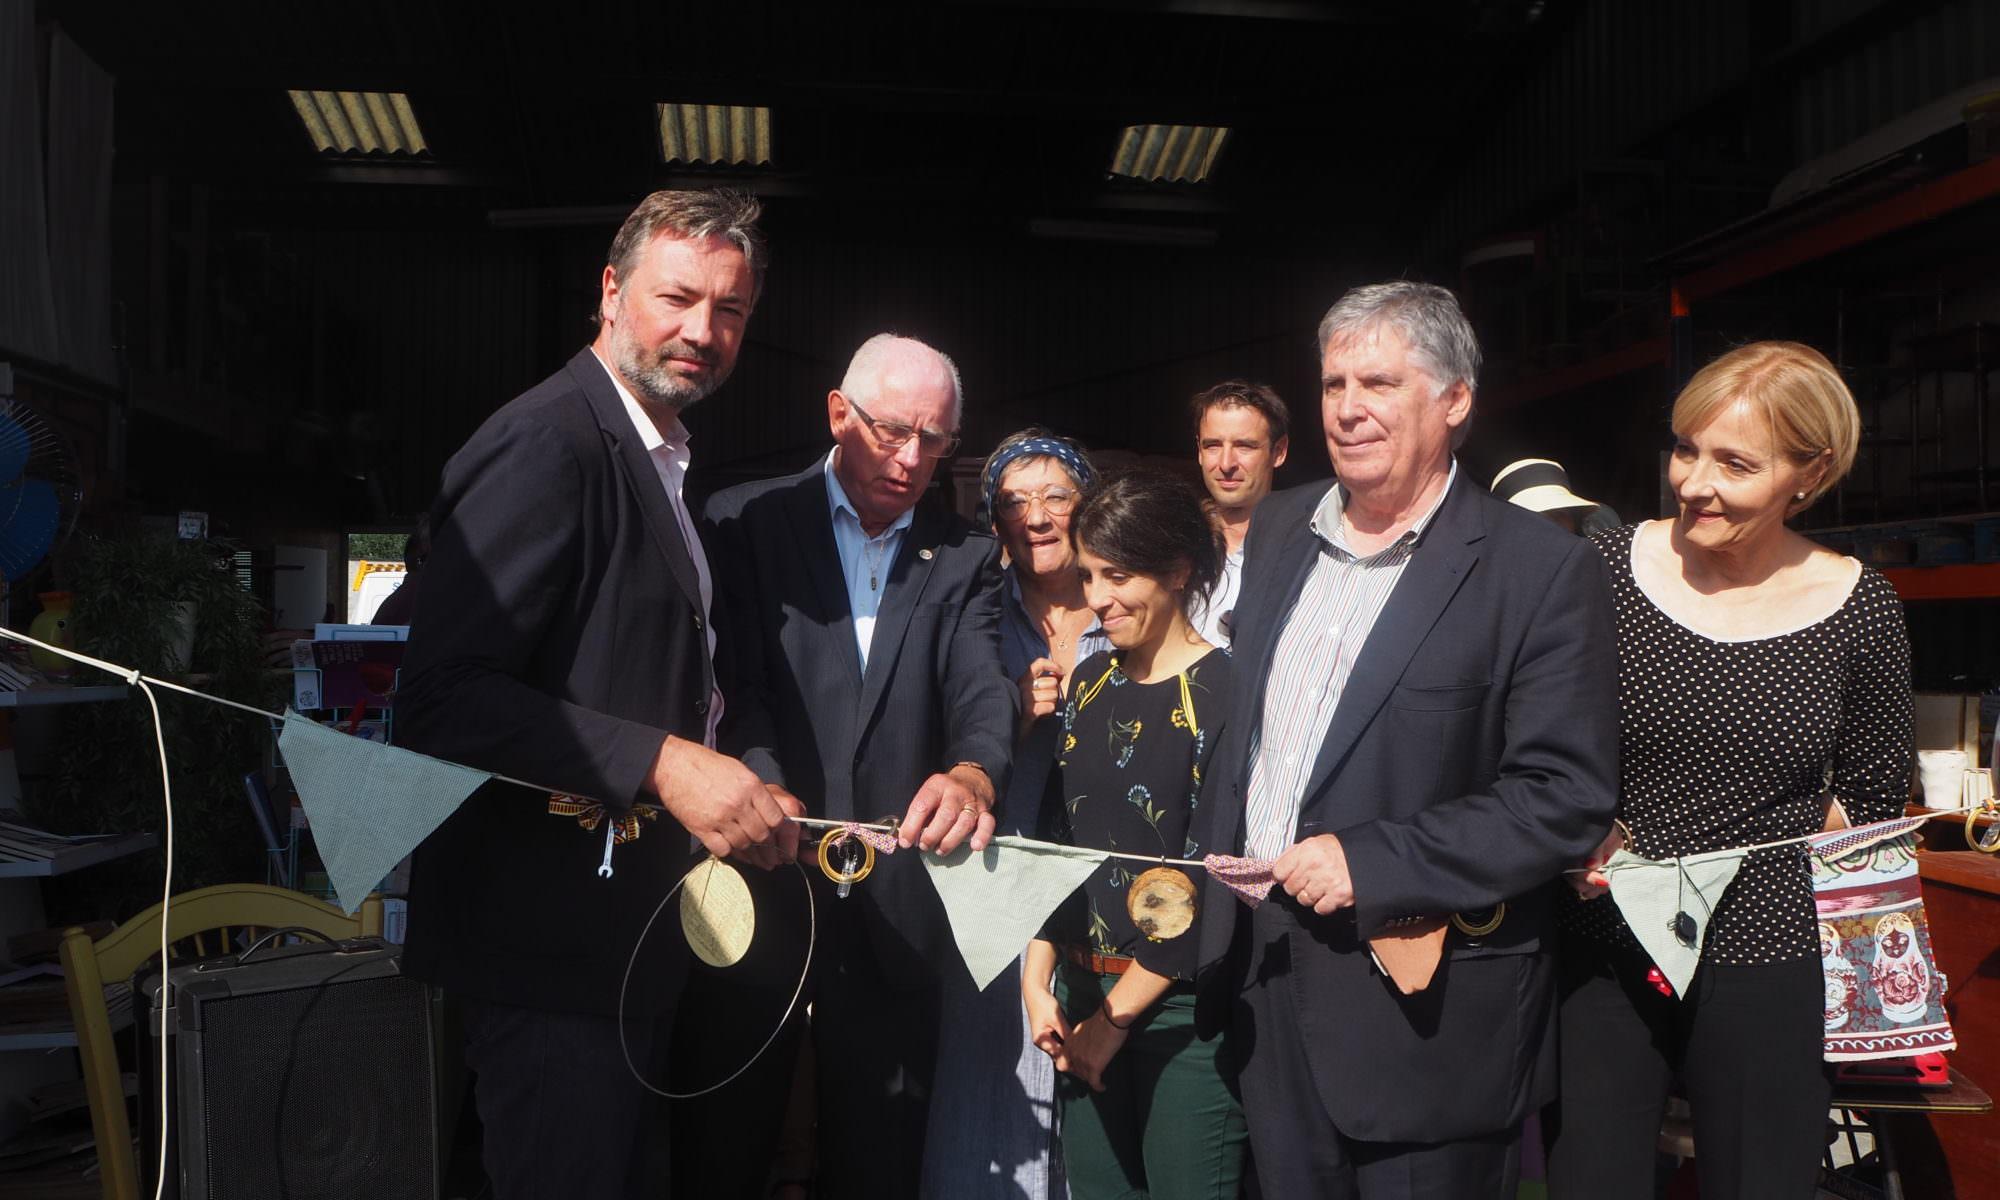 La Recyclerie ATENOBA inaugurée